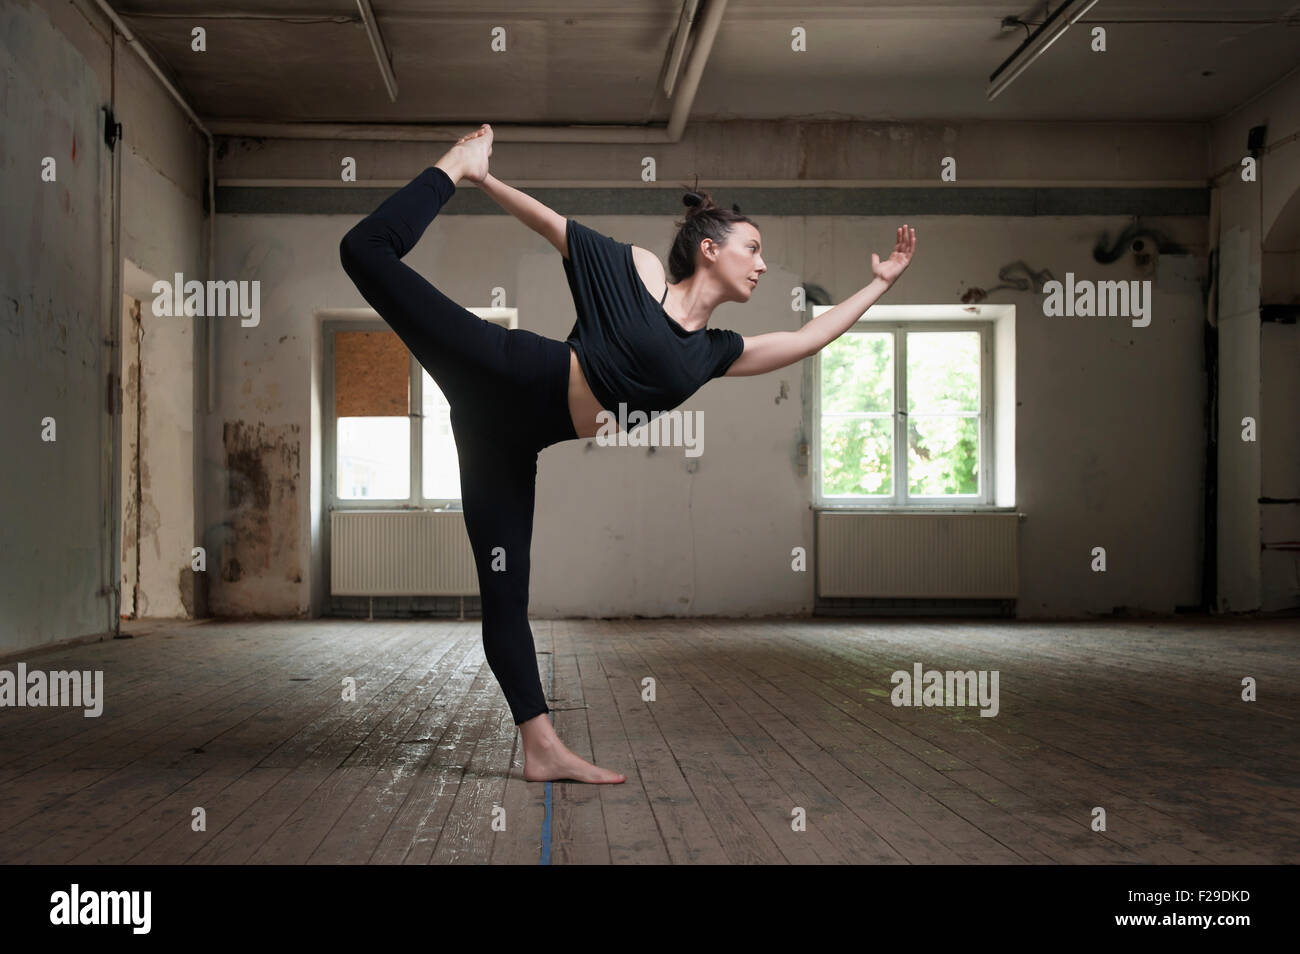 Mid adult woman practicing natarajasana pose in yoga studio, Munich, Bavaria, Germany - Stock Image